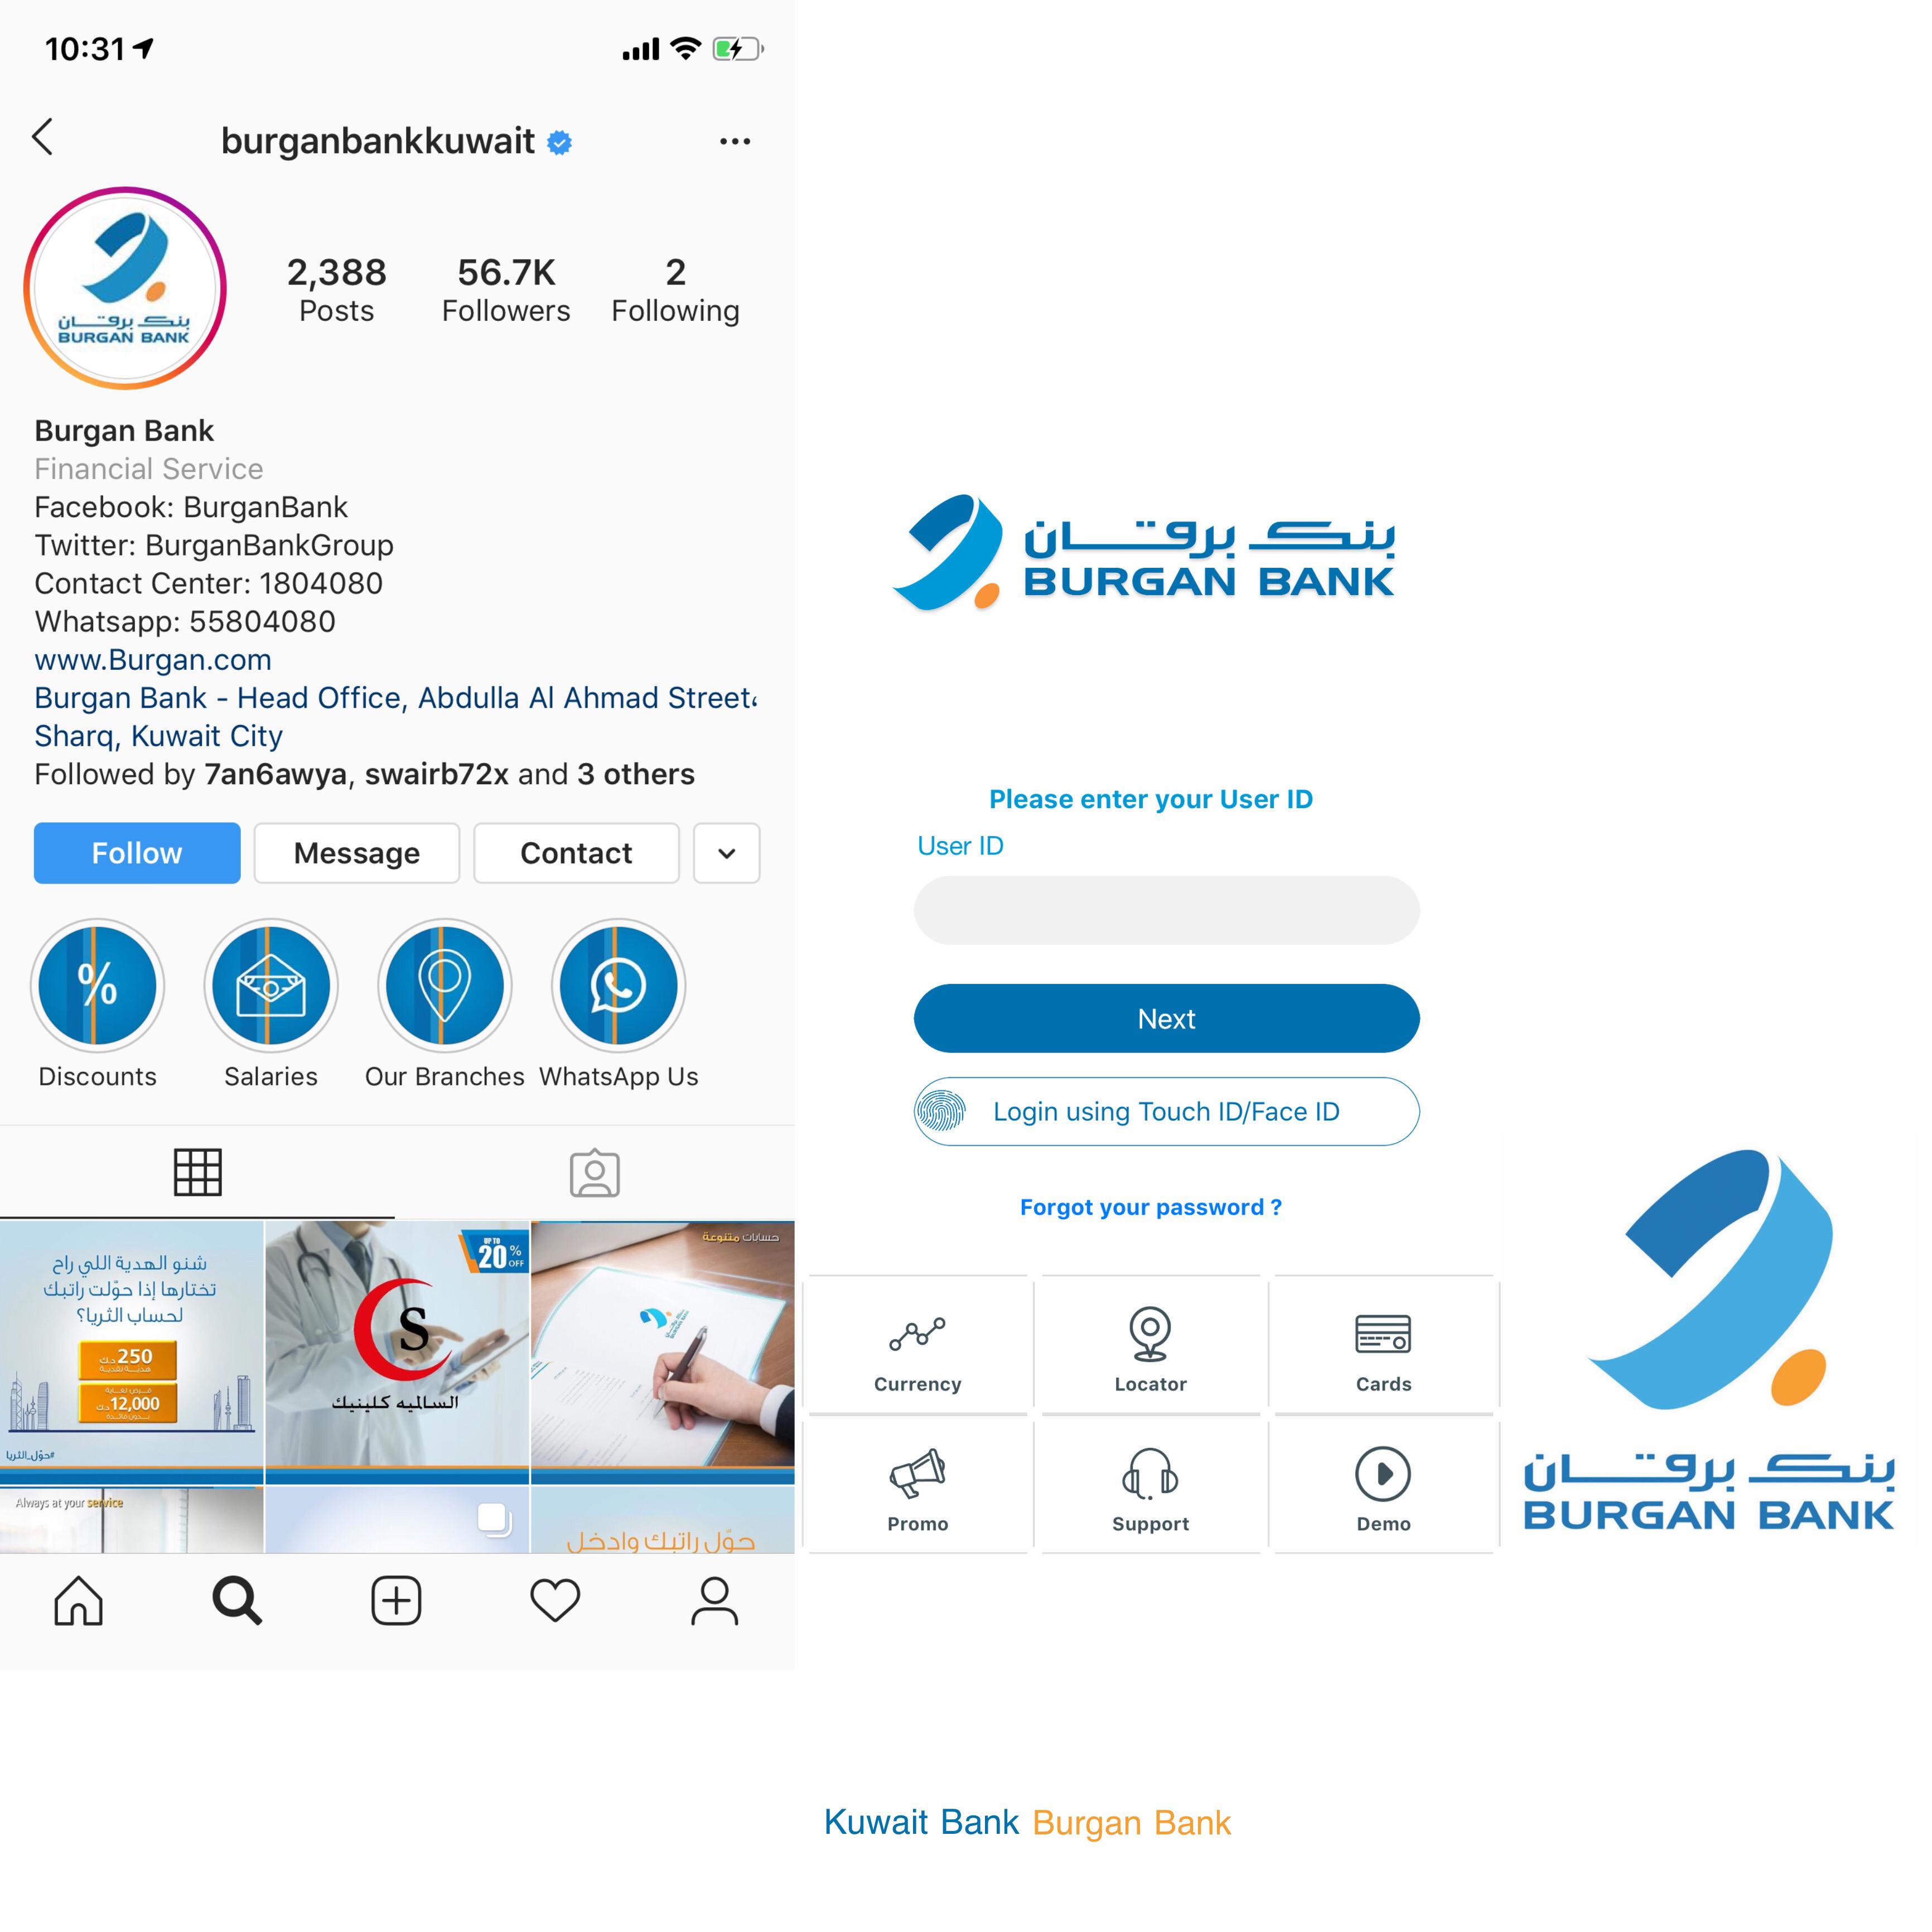 Pin By Esraa Almesri On Studio 2 Kuwaiti Brands Bank Financial Financial Services Kuwait City